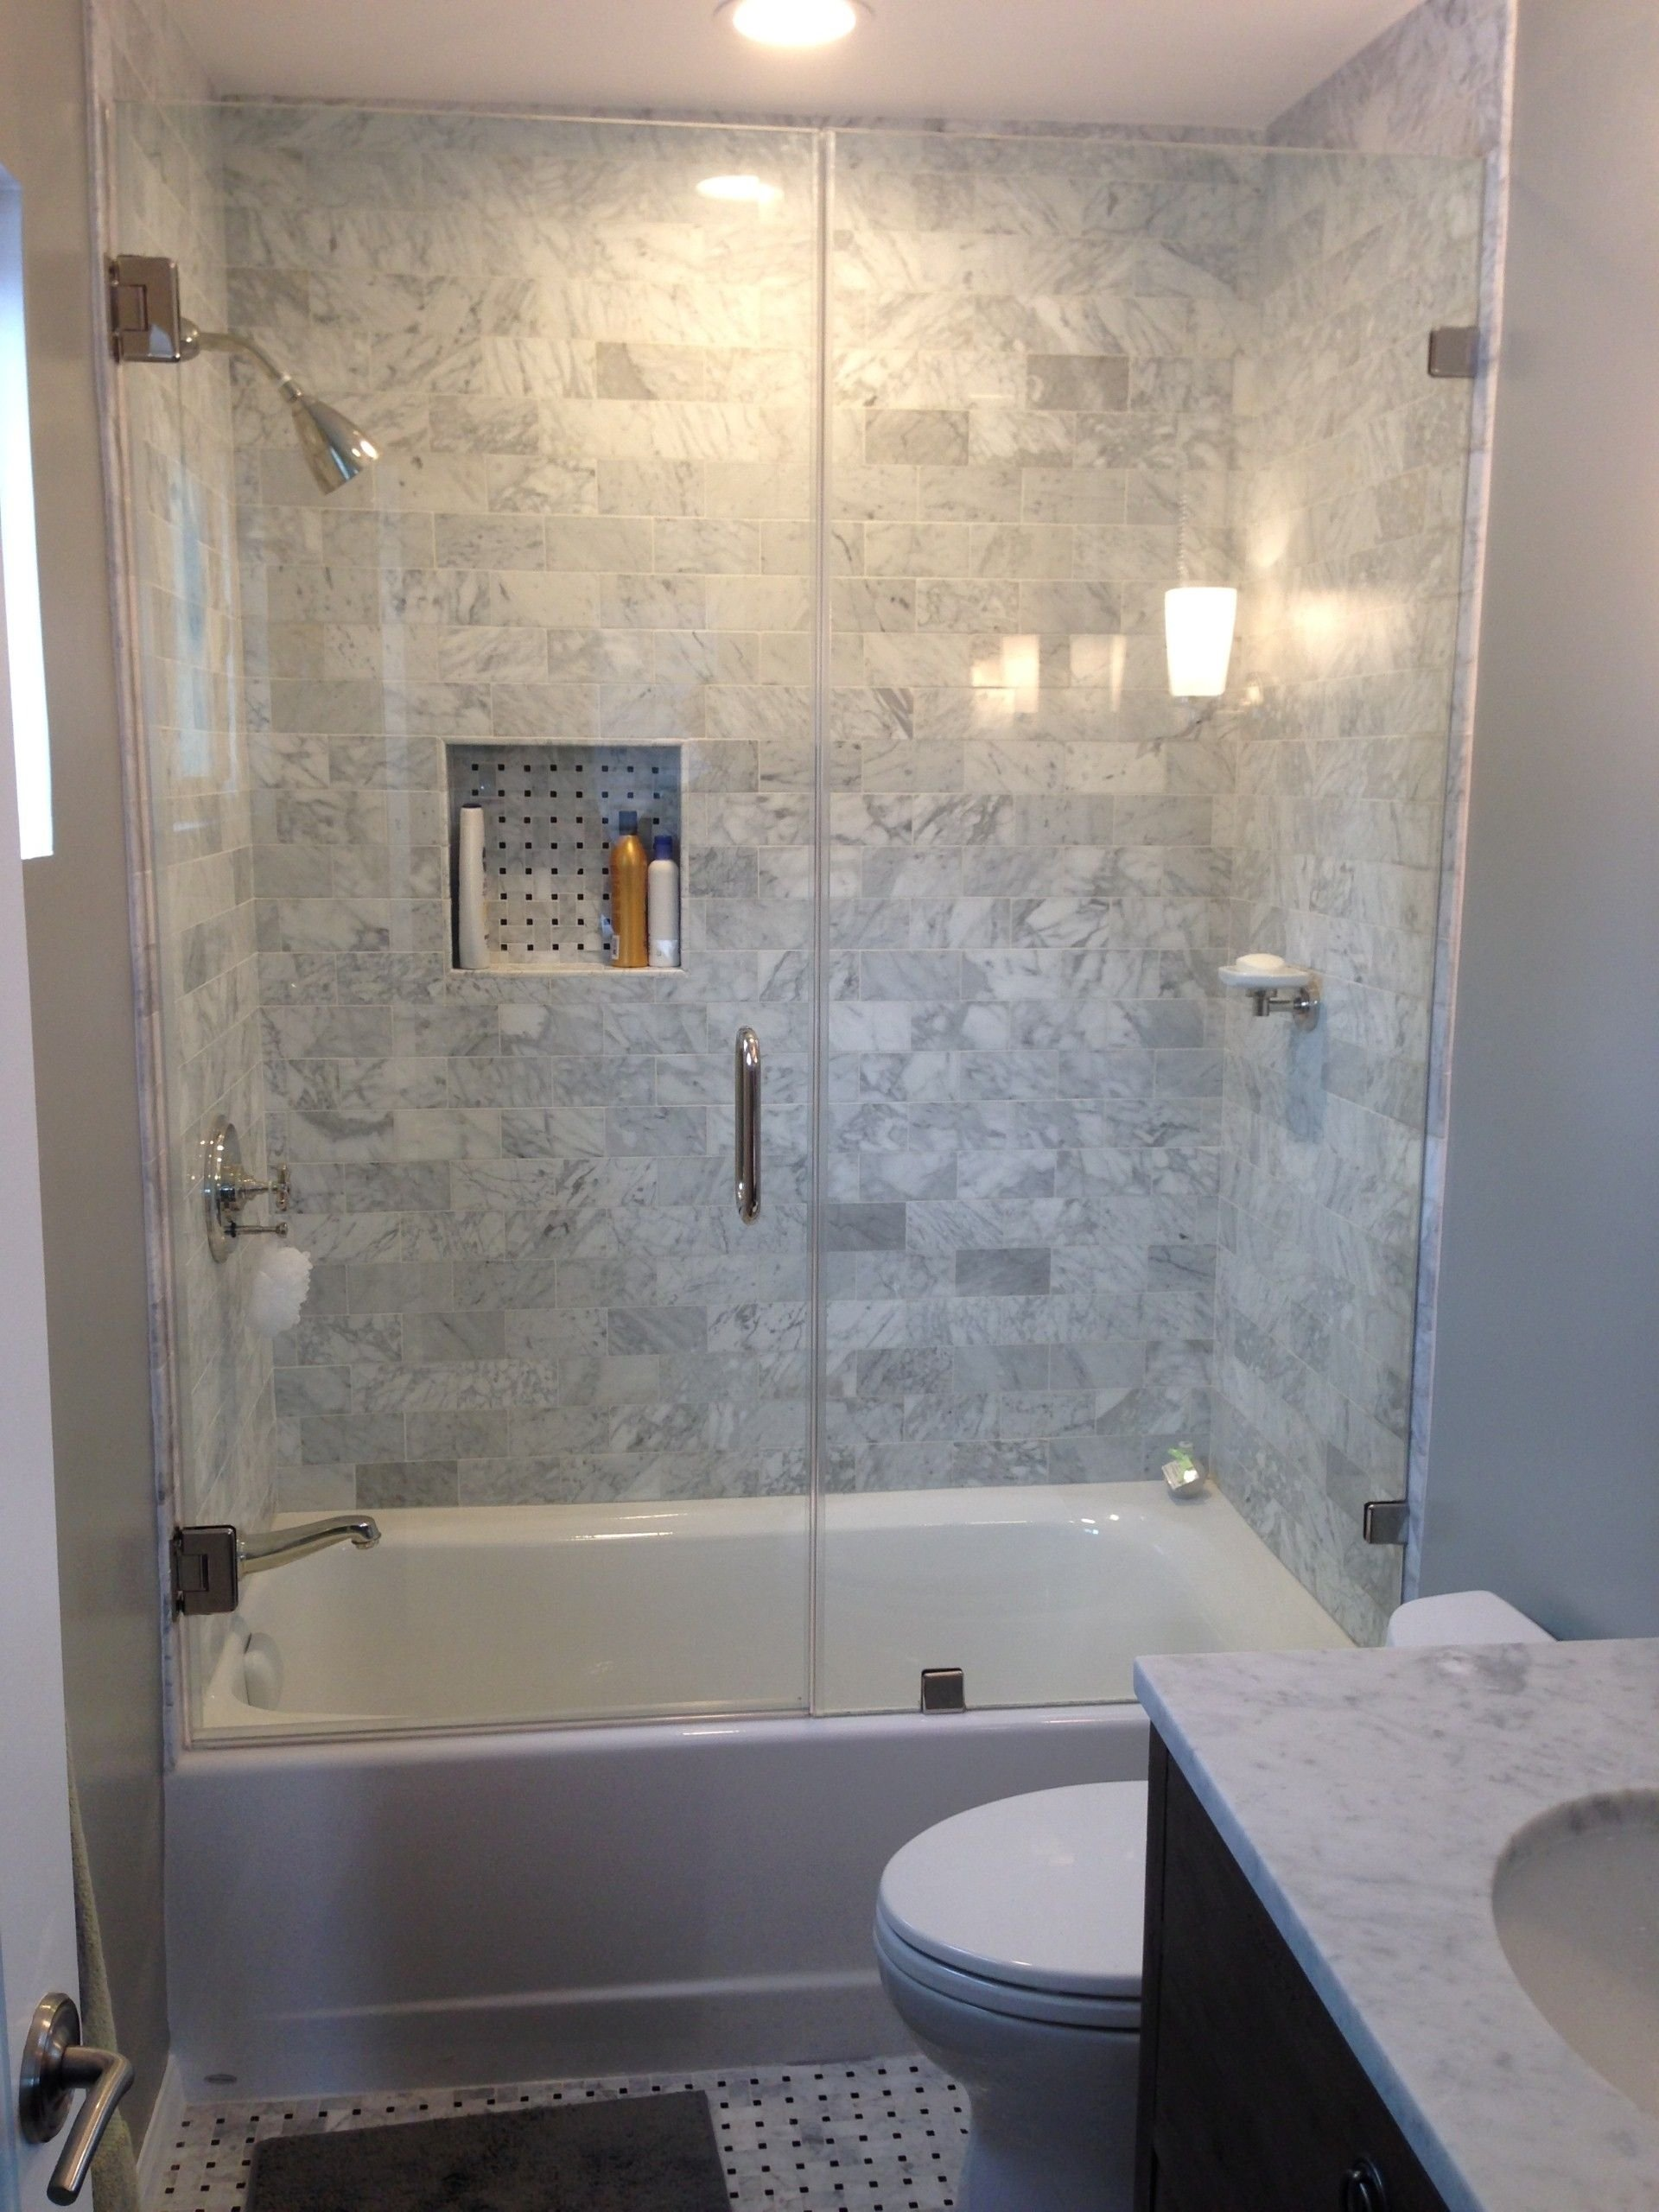 10 Spectacular Bath Ideas For Small Bathrooms extraordinary small bathroom designs with tub vie decor simple 1 2020